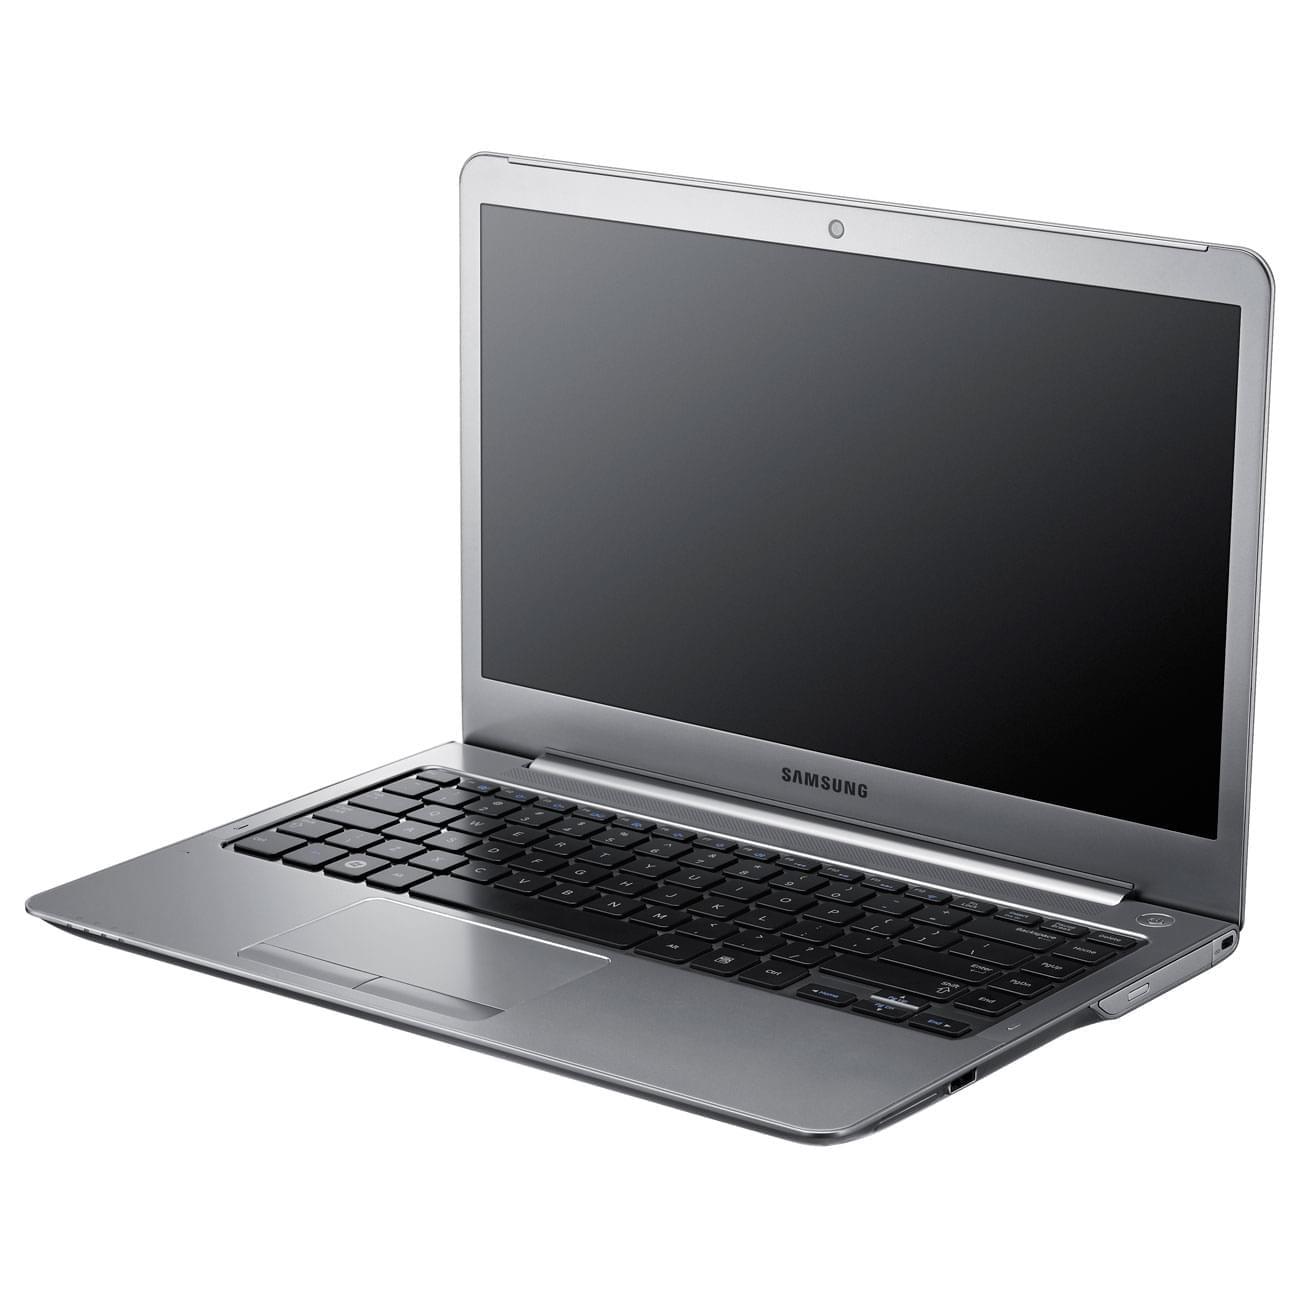 Samsung NP530U3B-A02FR - PC portable Samsung - Cybertek.fr - 0